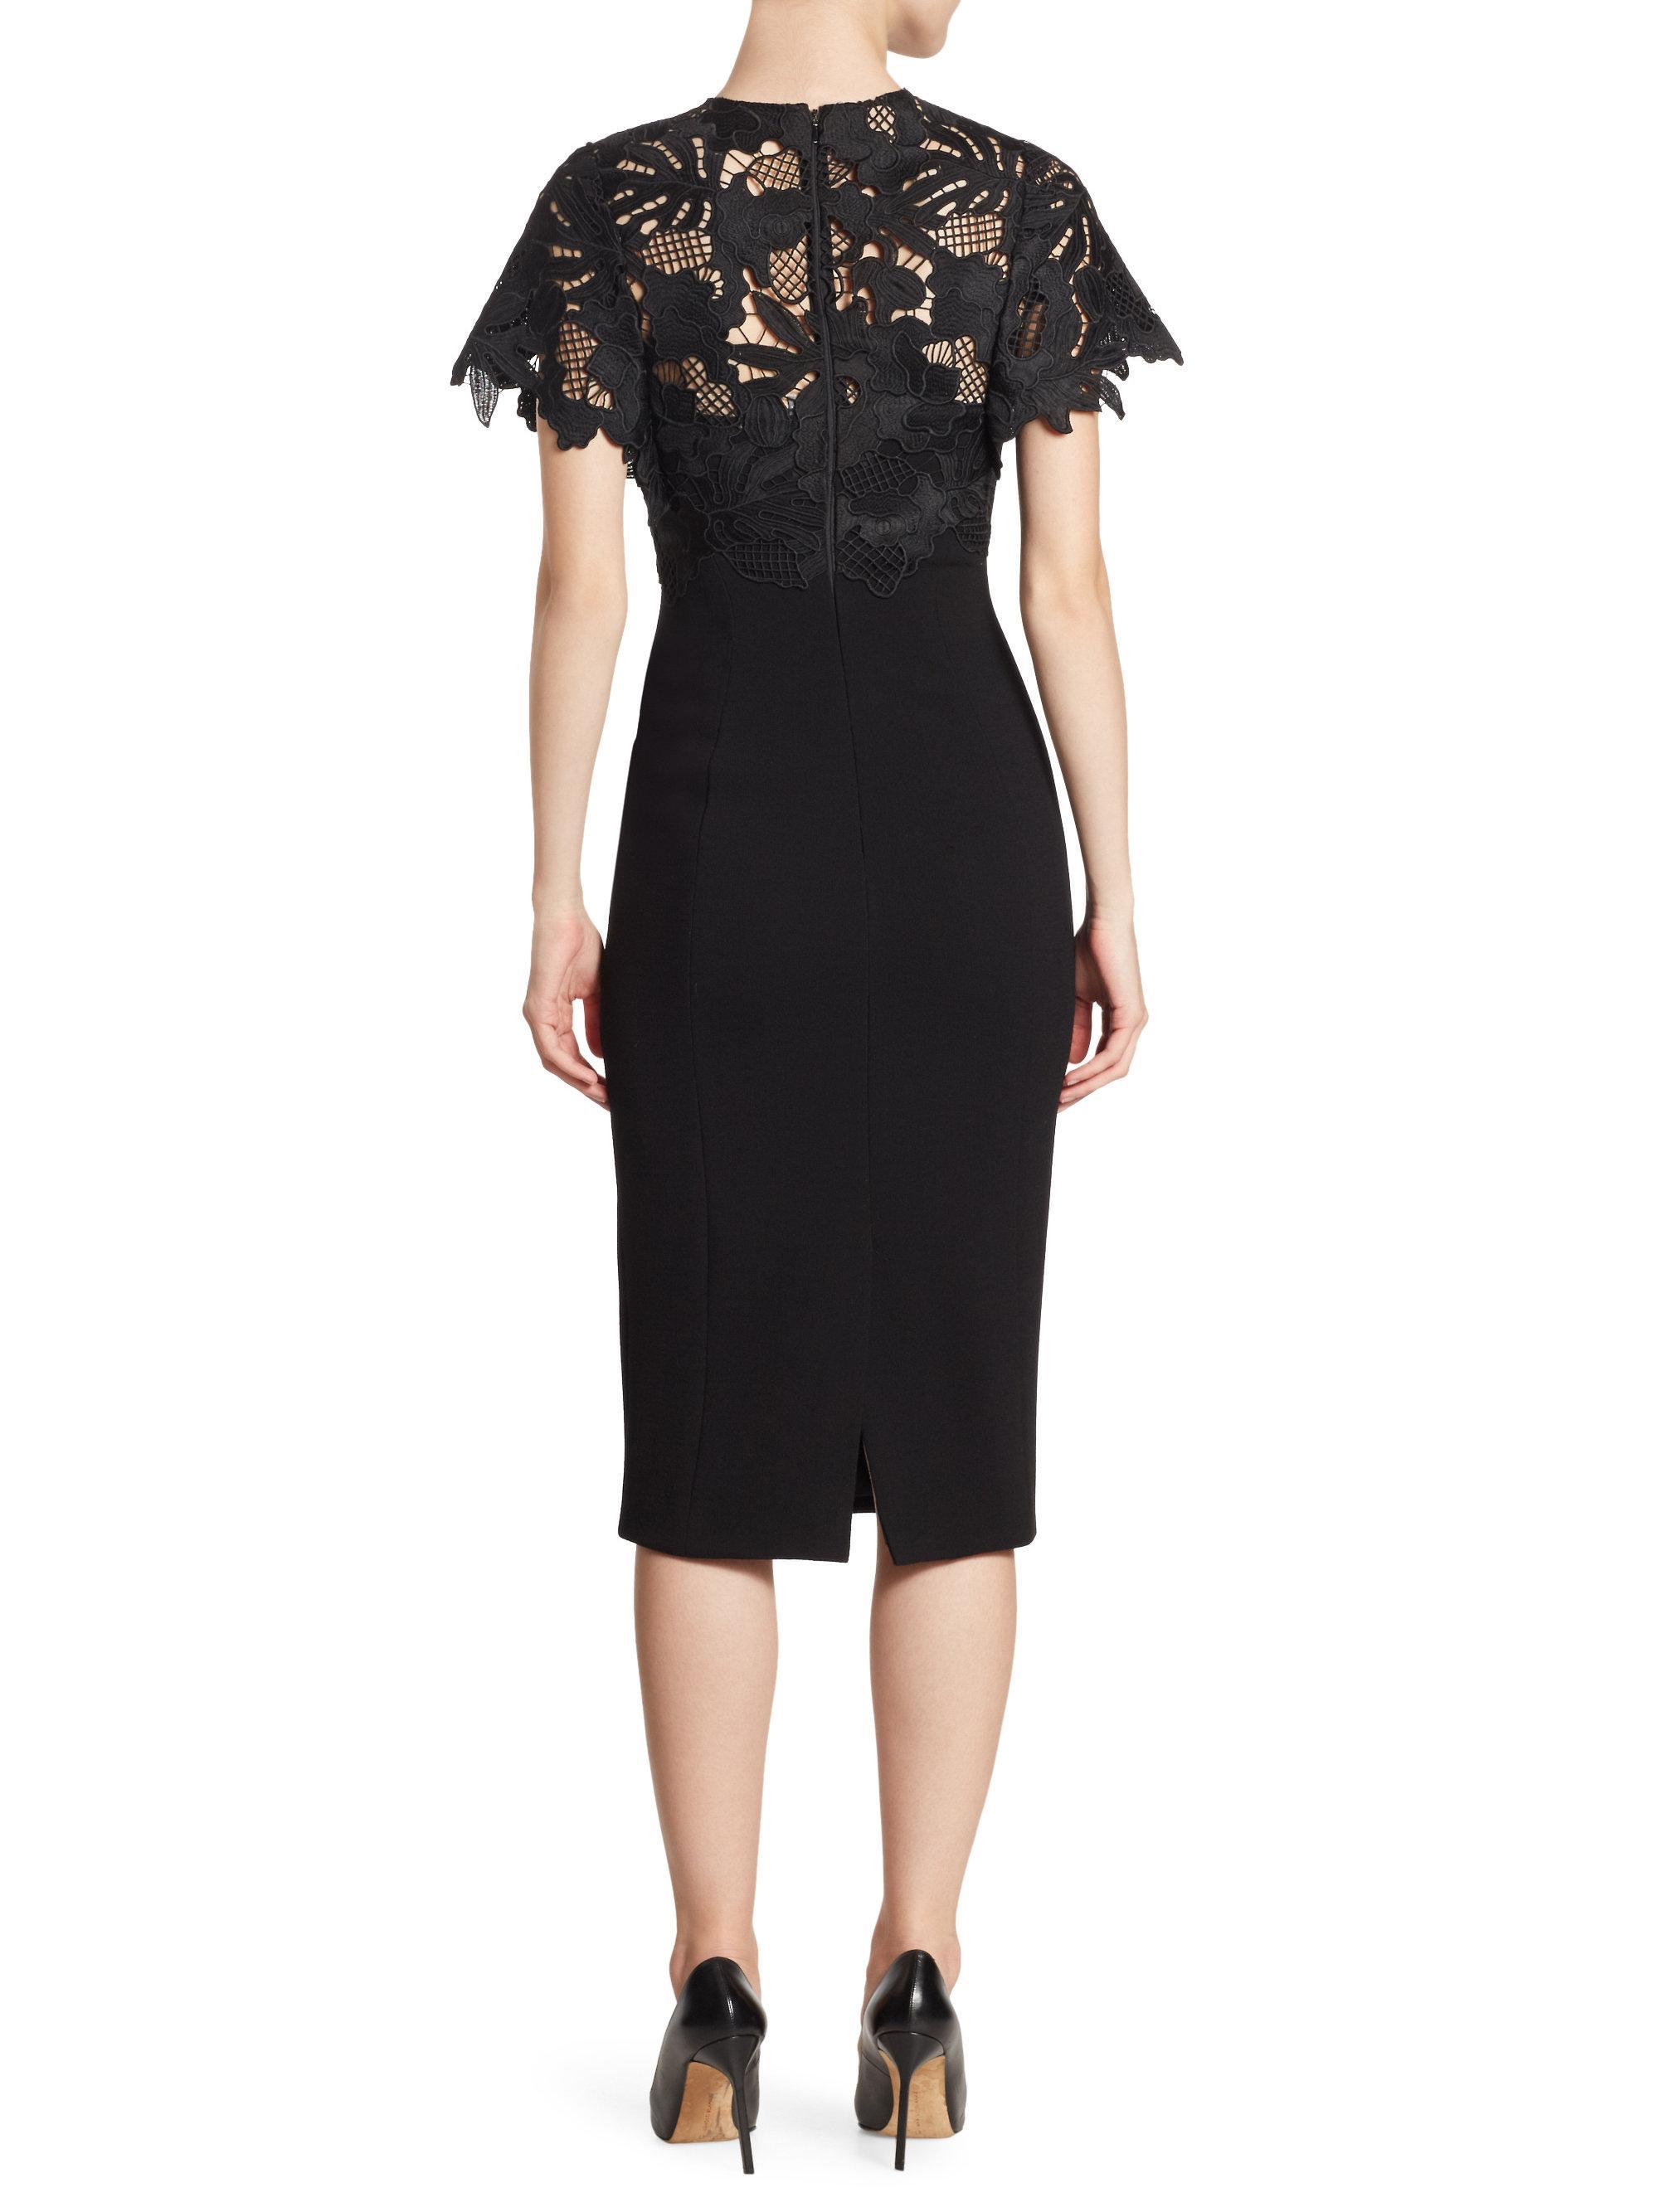 Lela rose lace sheath dress in black lyst for Saks fifth avenue wedding guest dresses